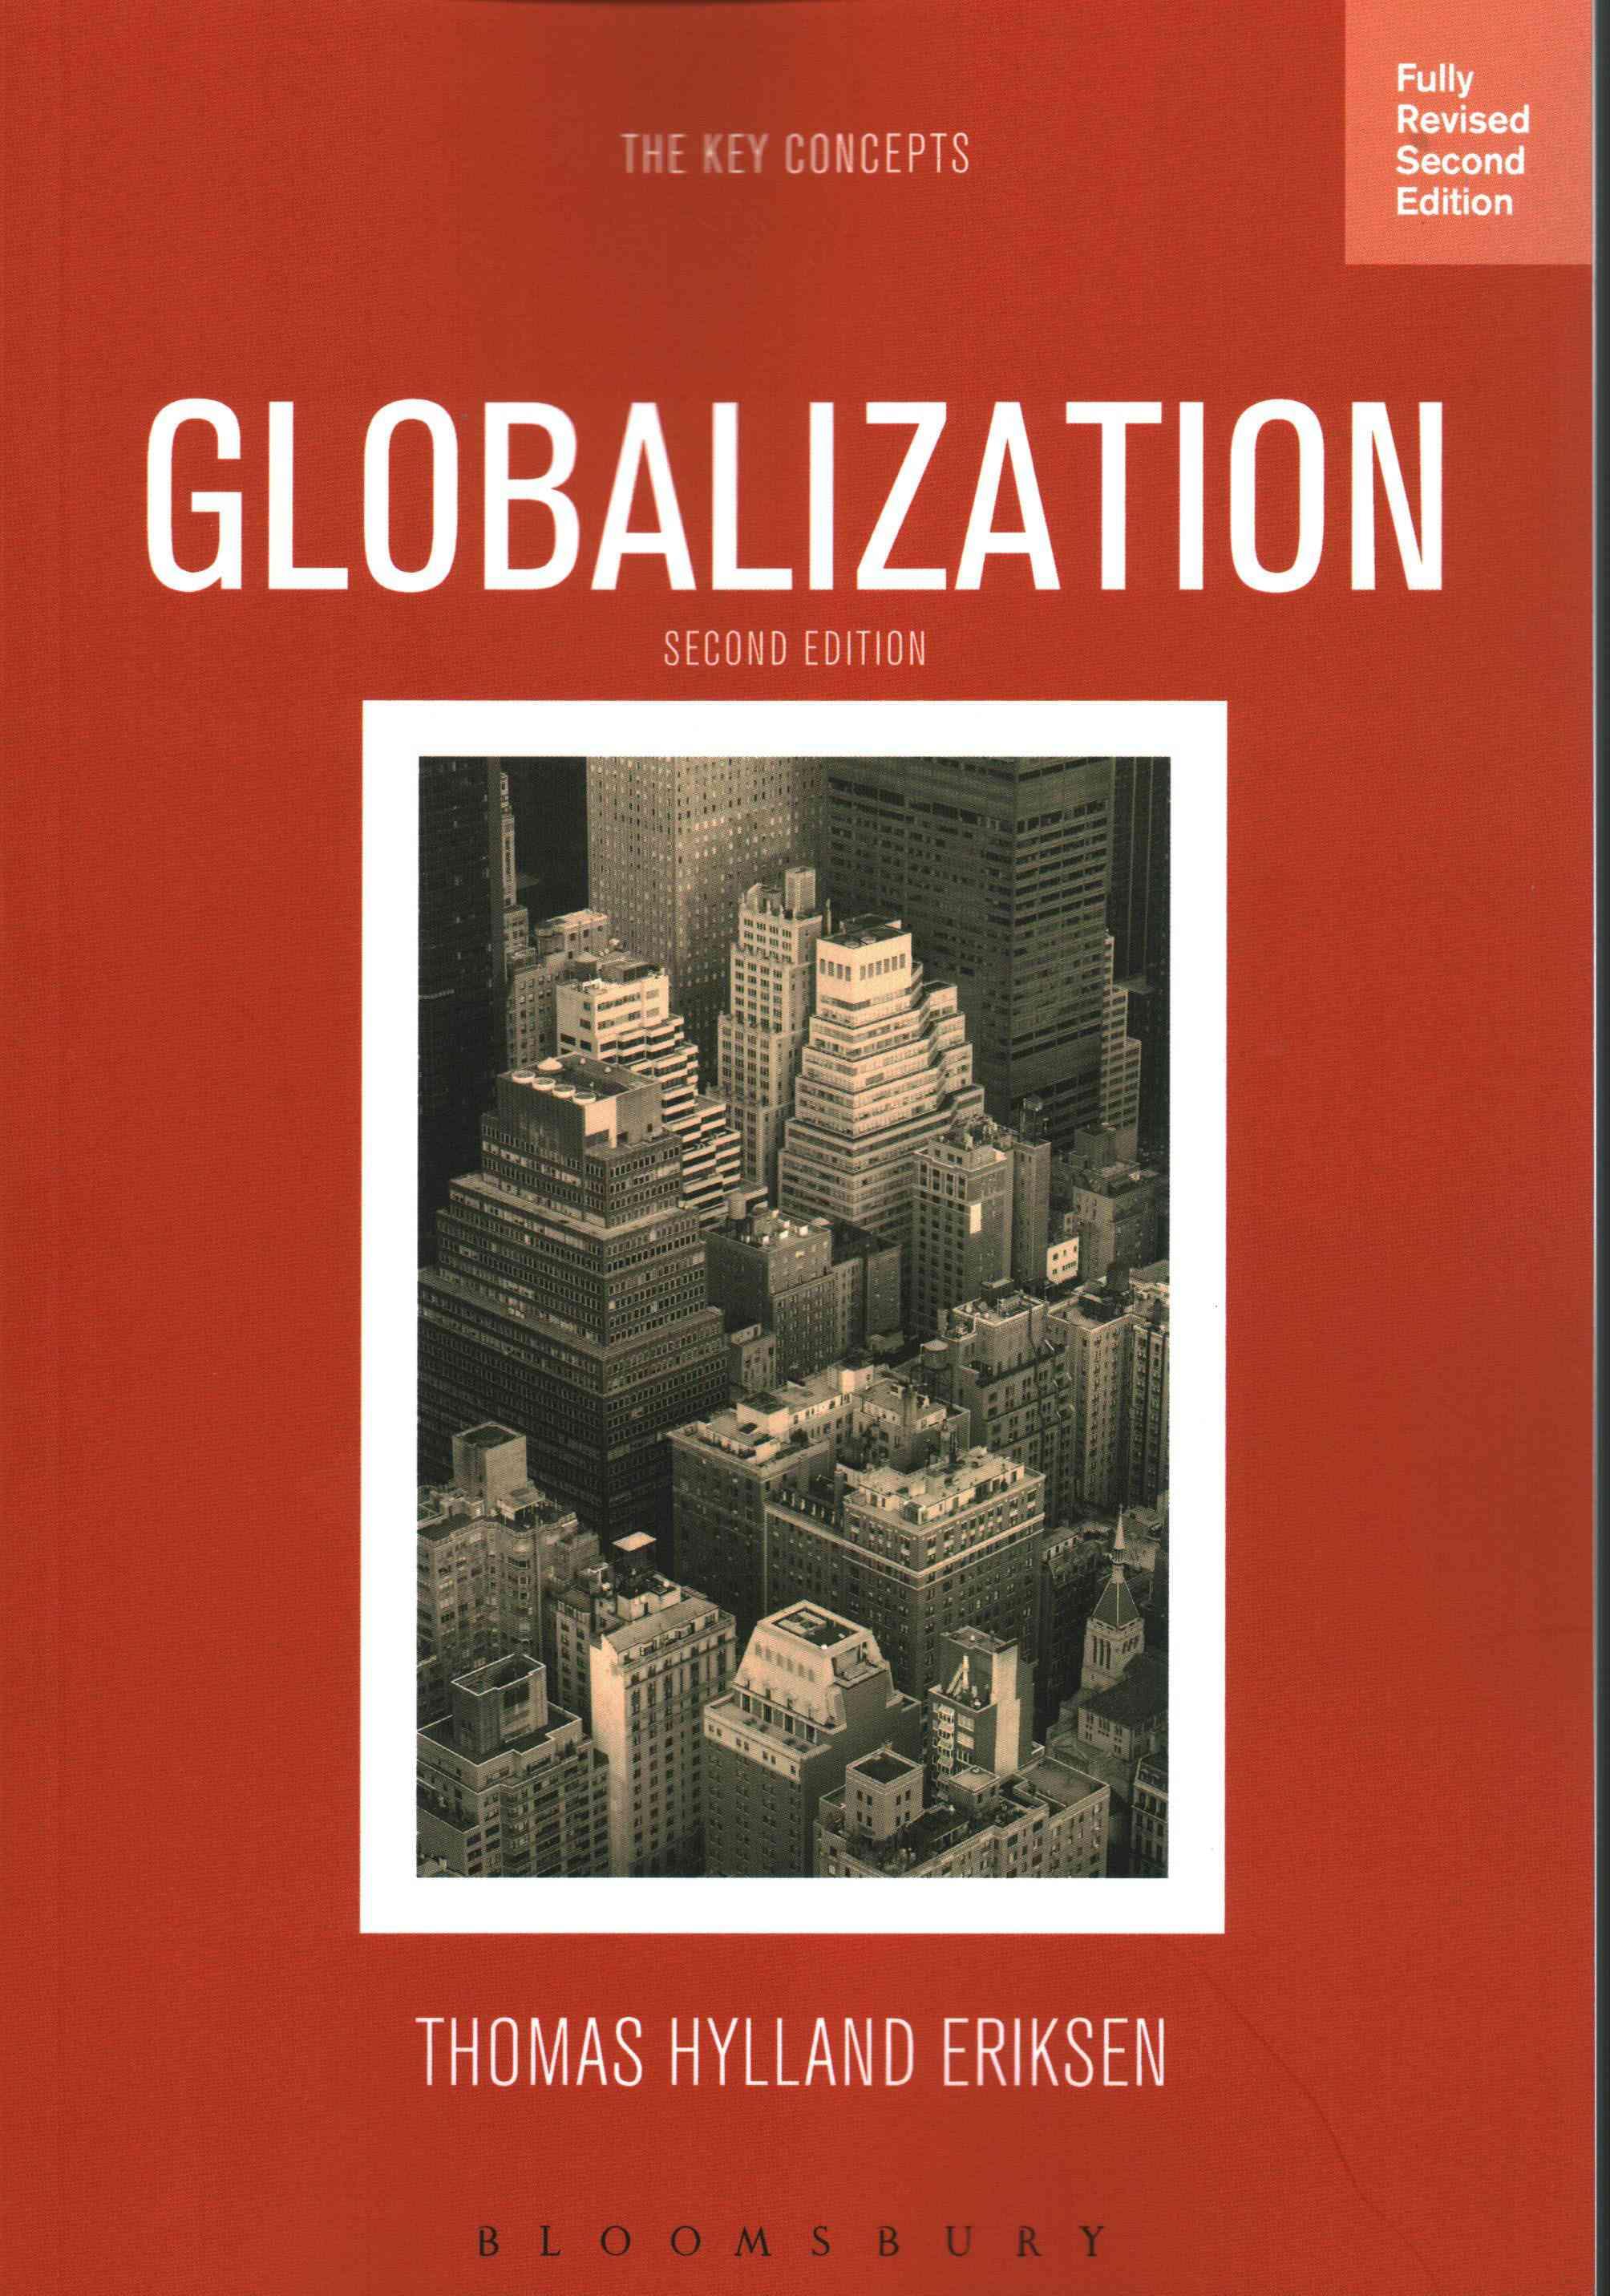 Globalization By Eriksen, Thomas Hylland